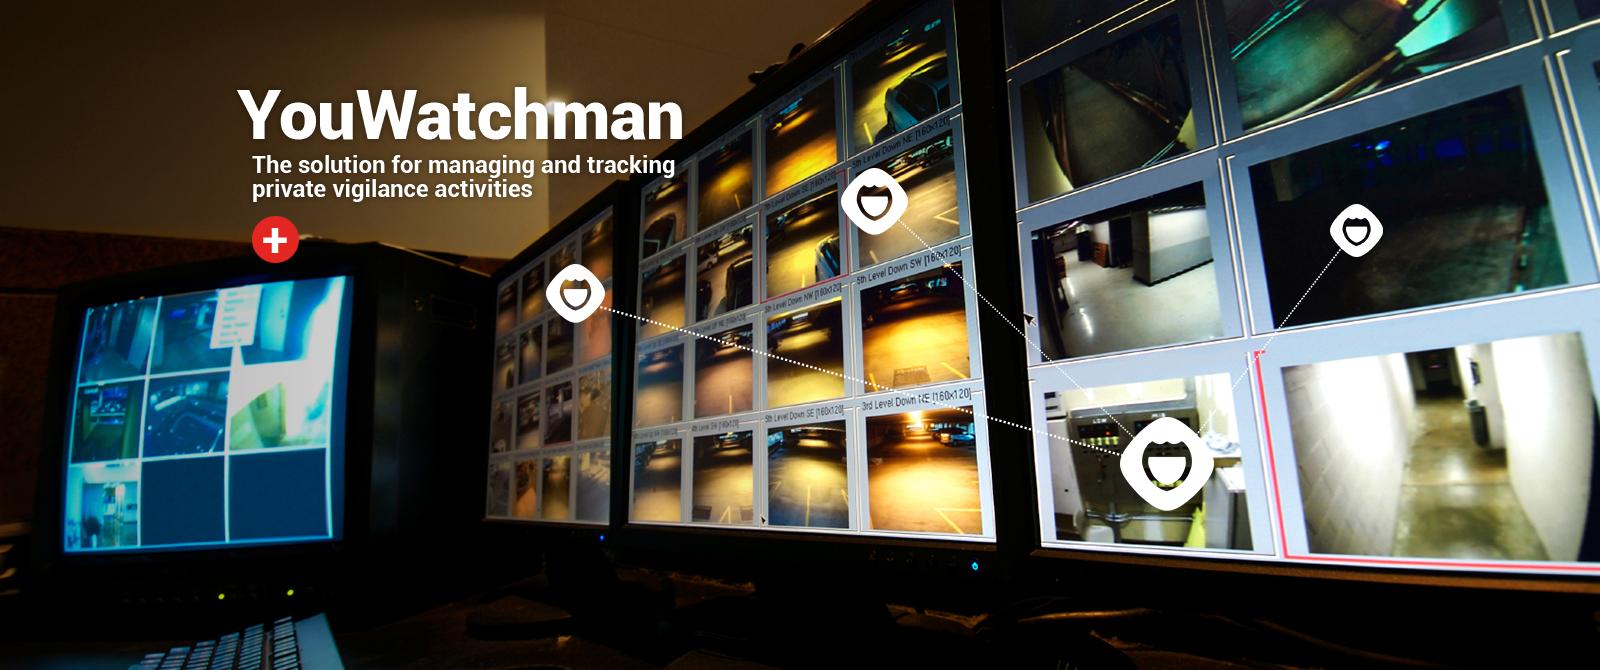 youwatchman